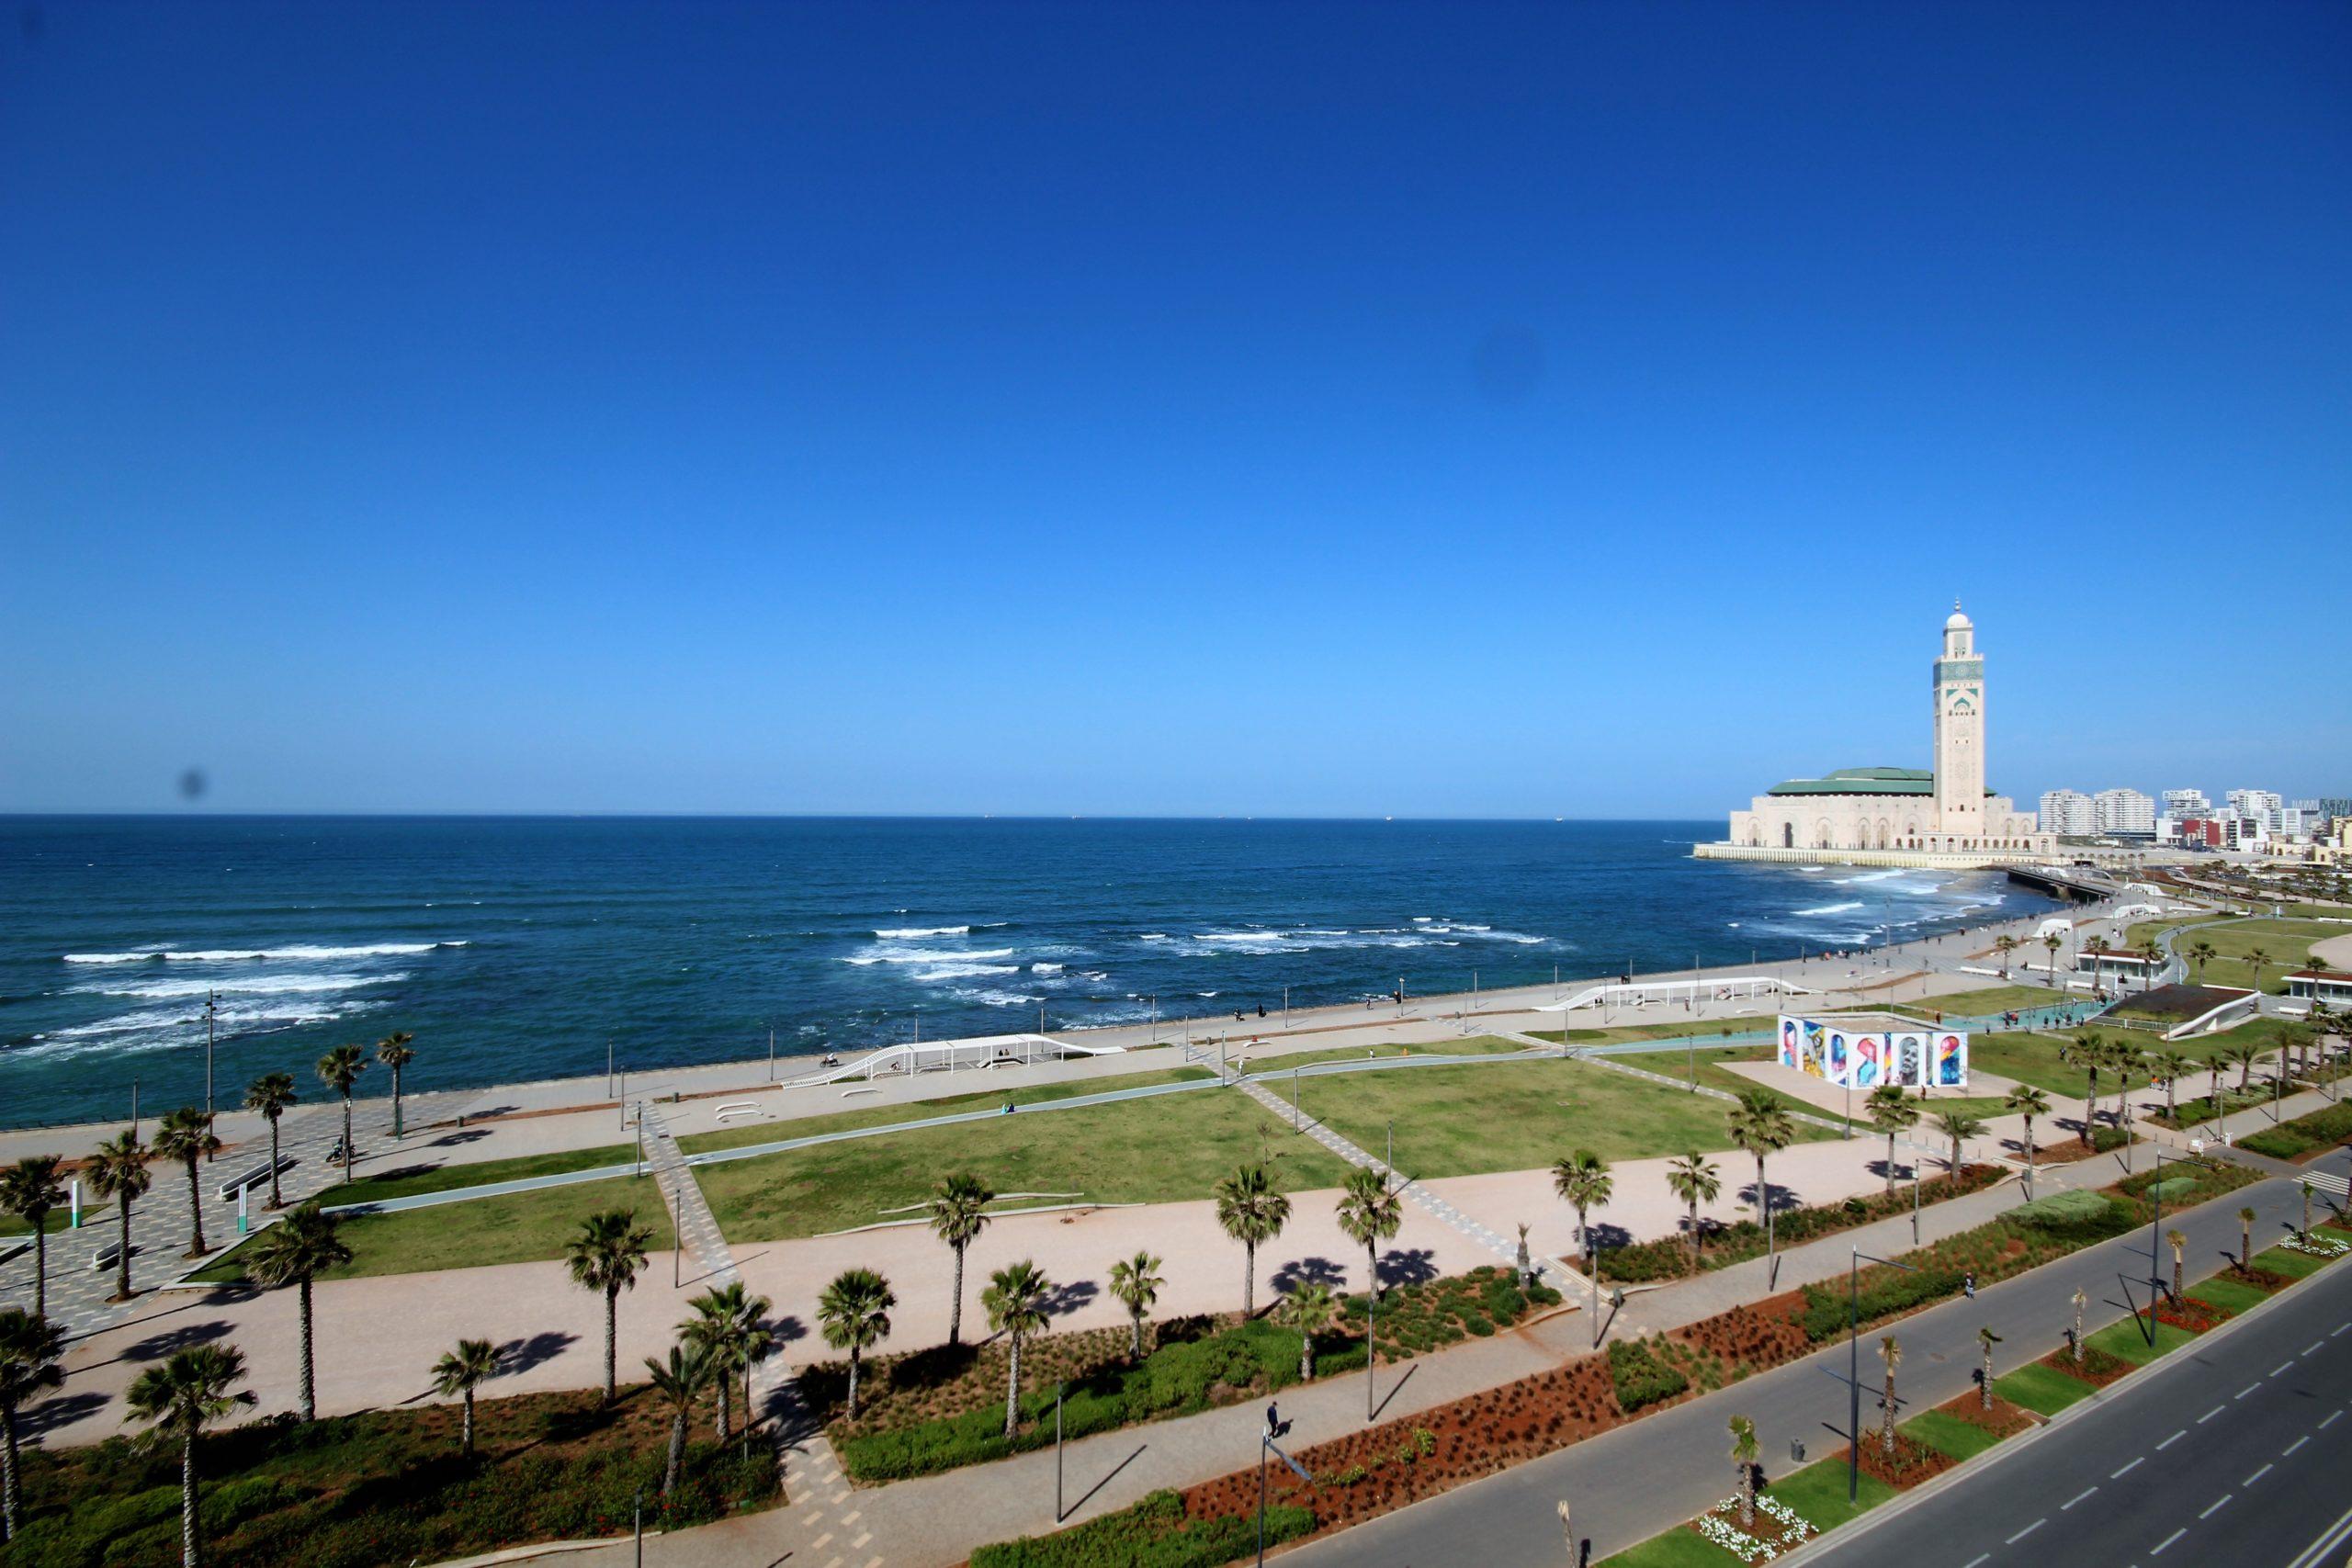 Maroc, Casablanca, Corniche secteur Hassan II, à acheter parfait 52m² terrasse Neuf